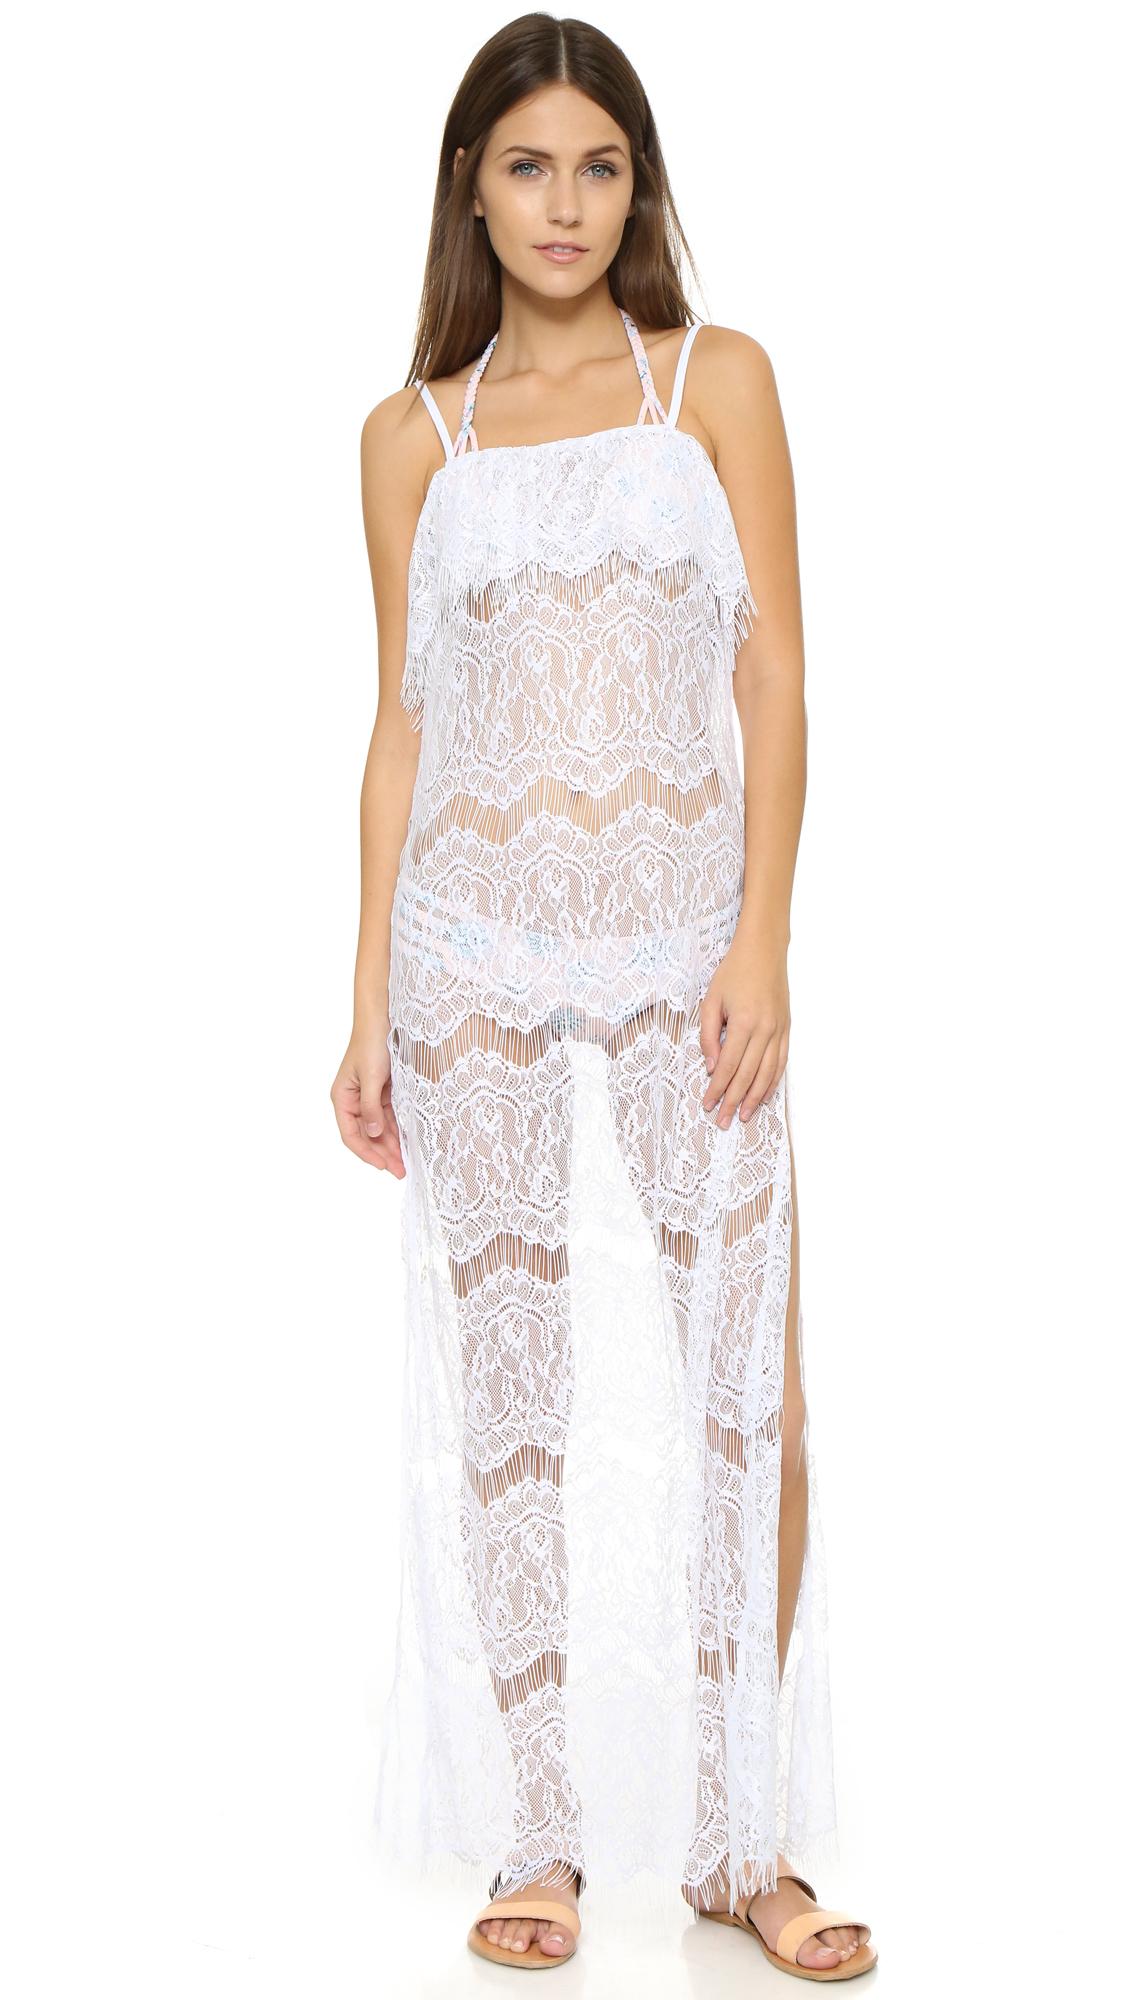 Lyst - Peixoto Long Lace Dress in White